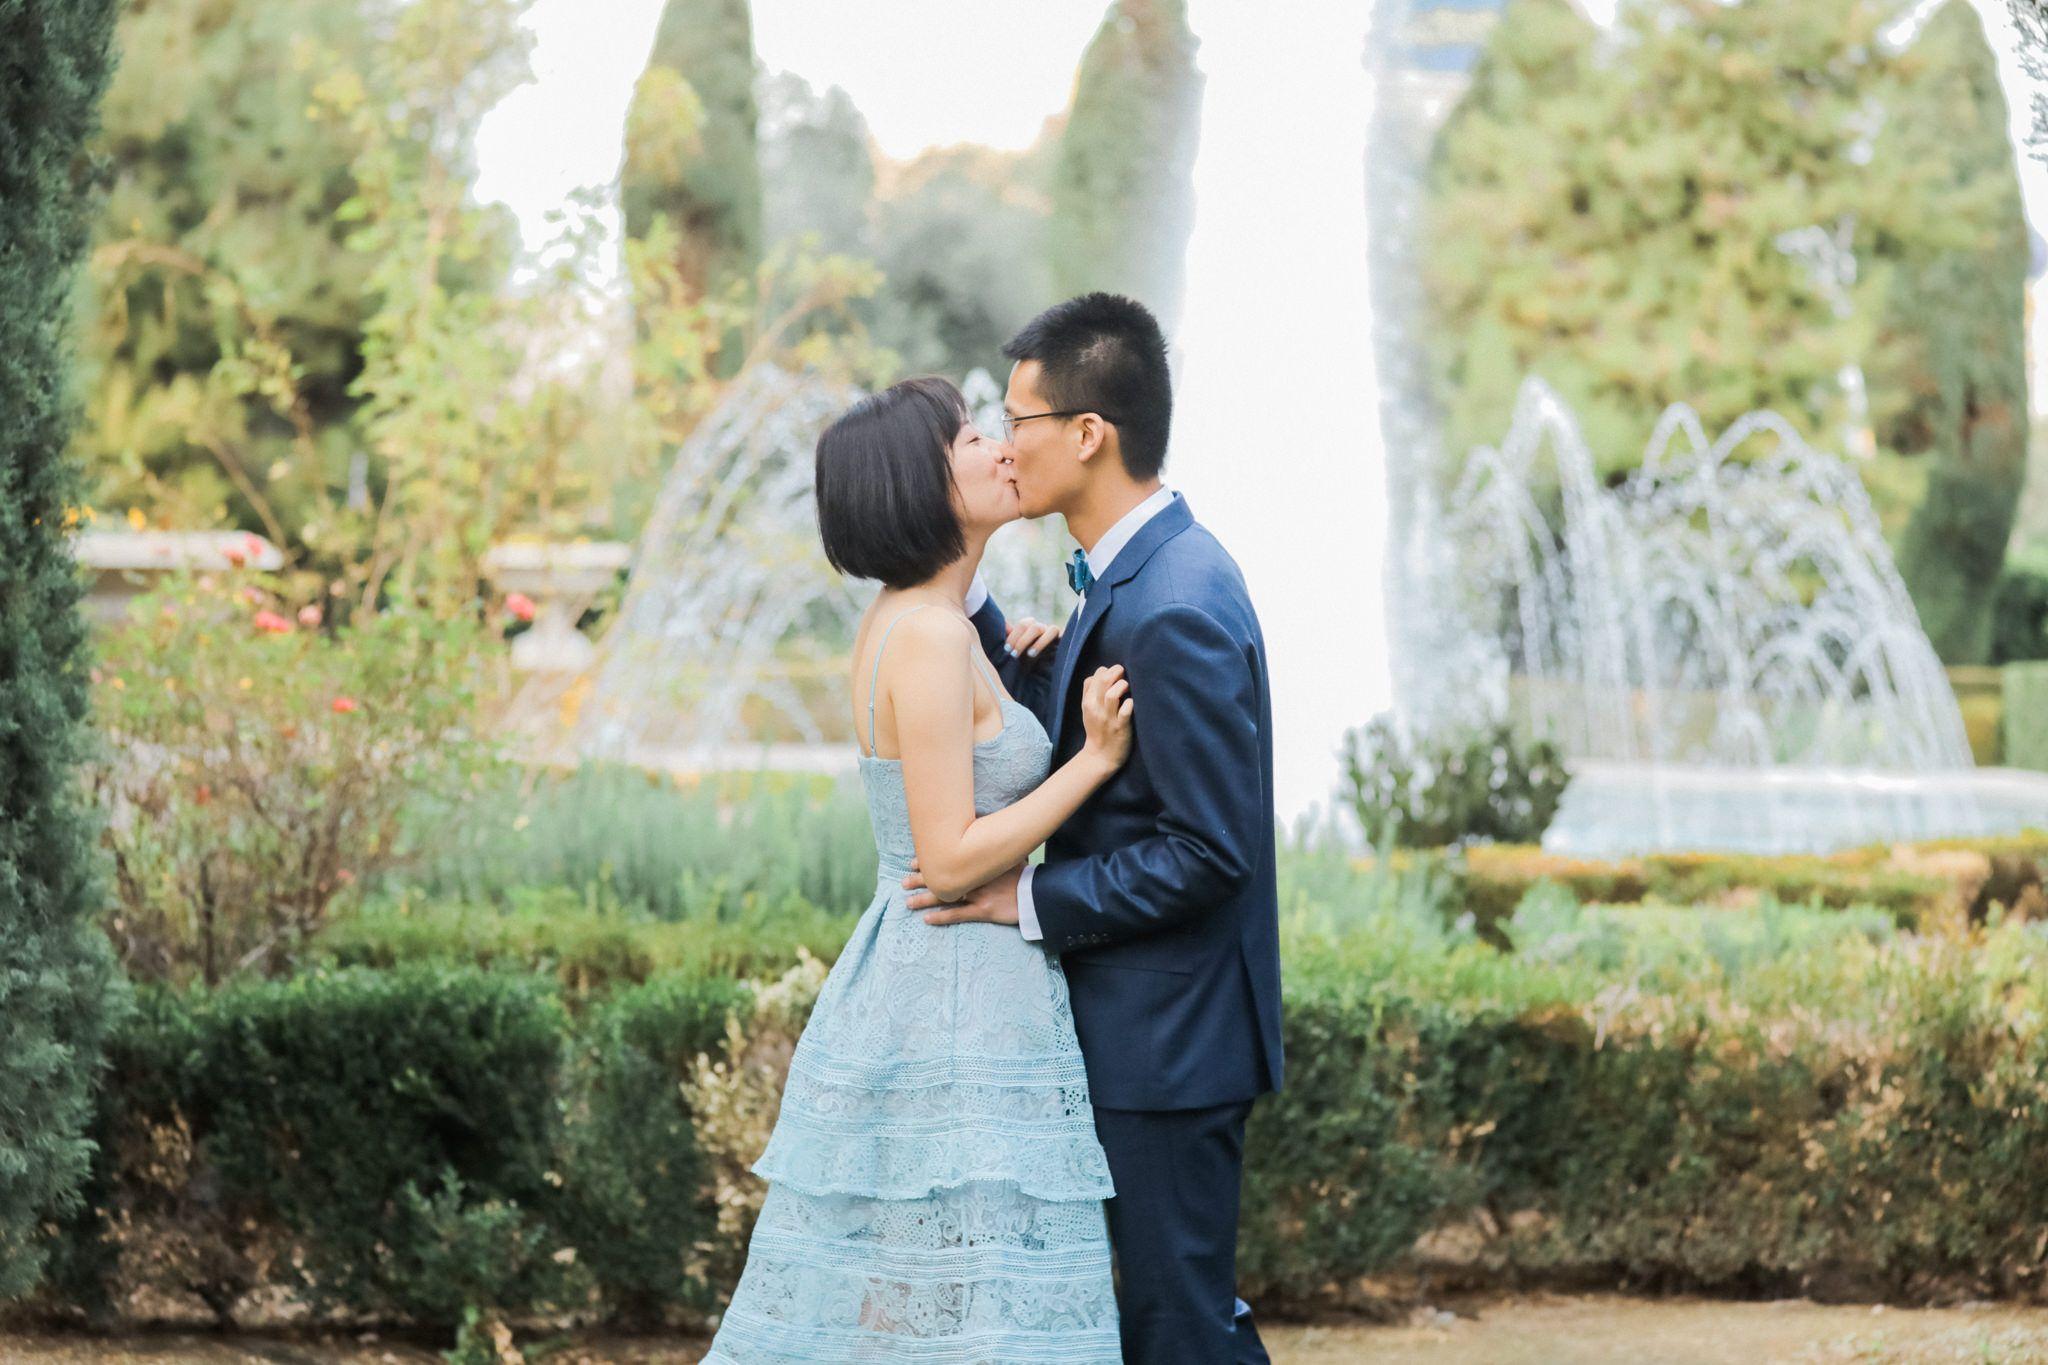 Las Vegas Elopement Wedding Ceremony photo Susie & Will